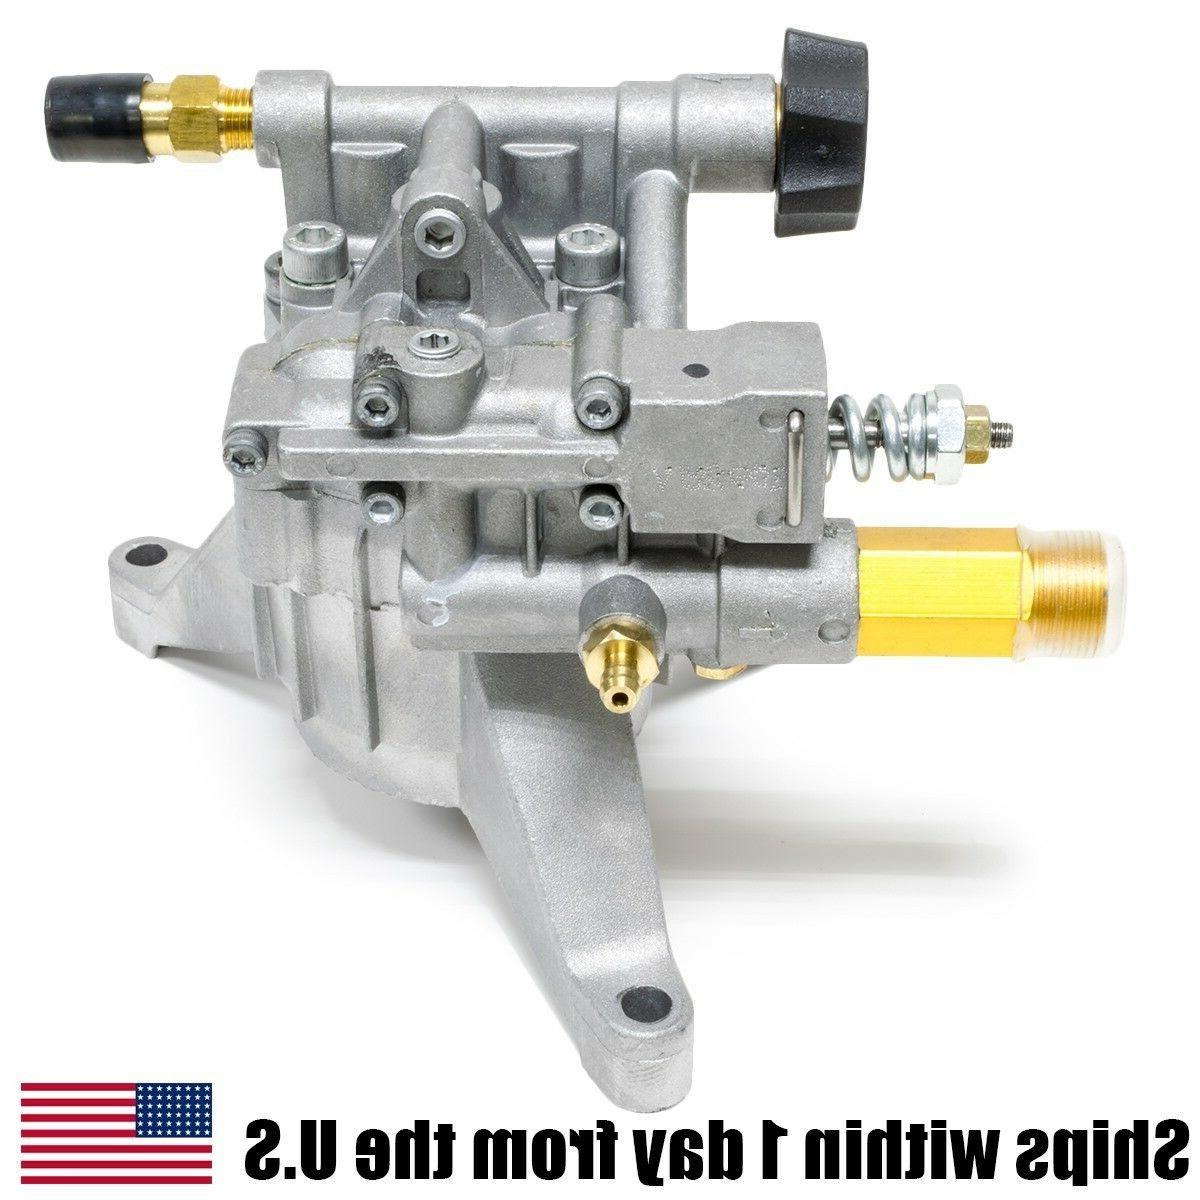 Vertical Pressure Washer Water Pump 2.4GPM 2700psi 308653025